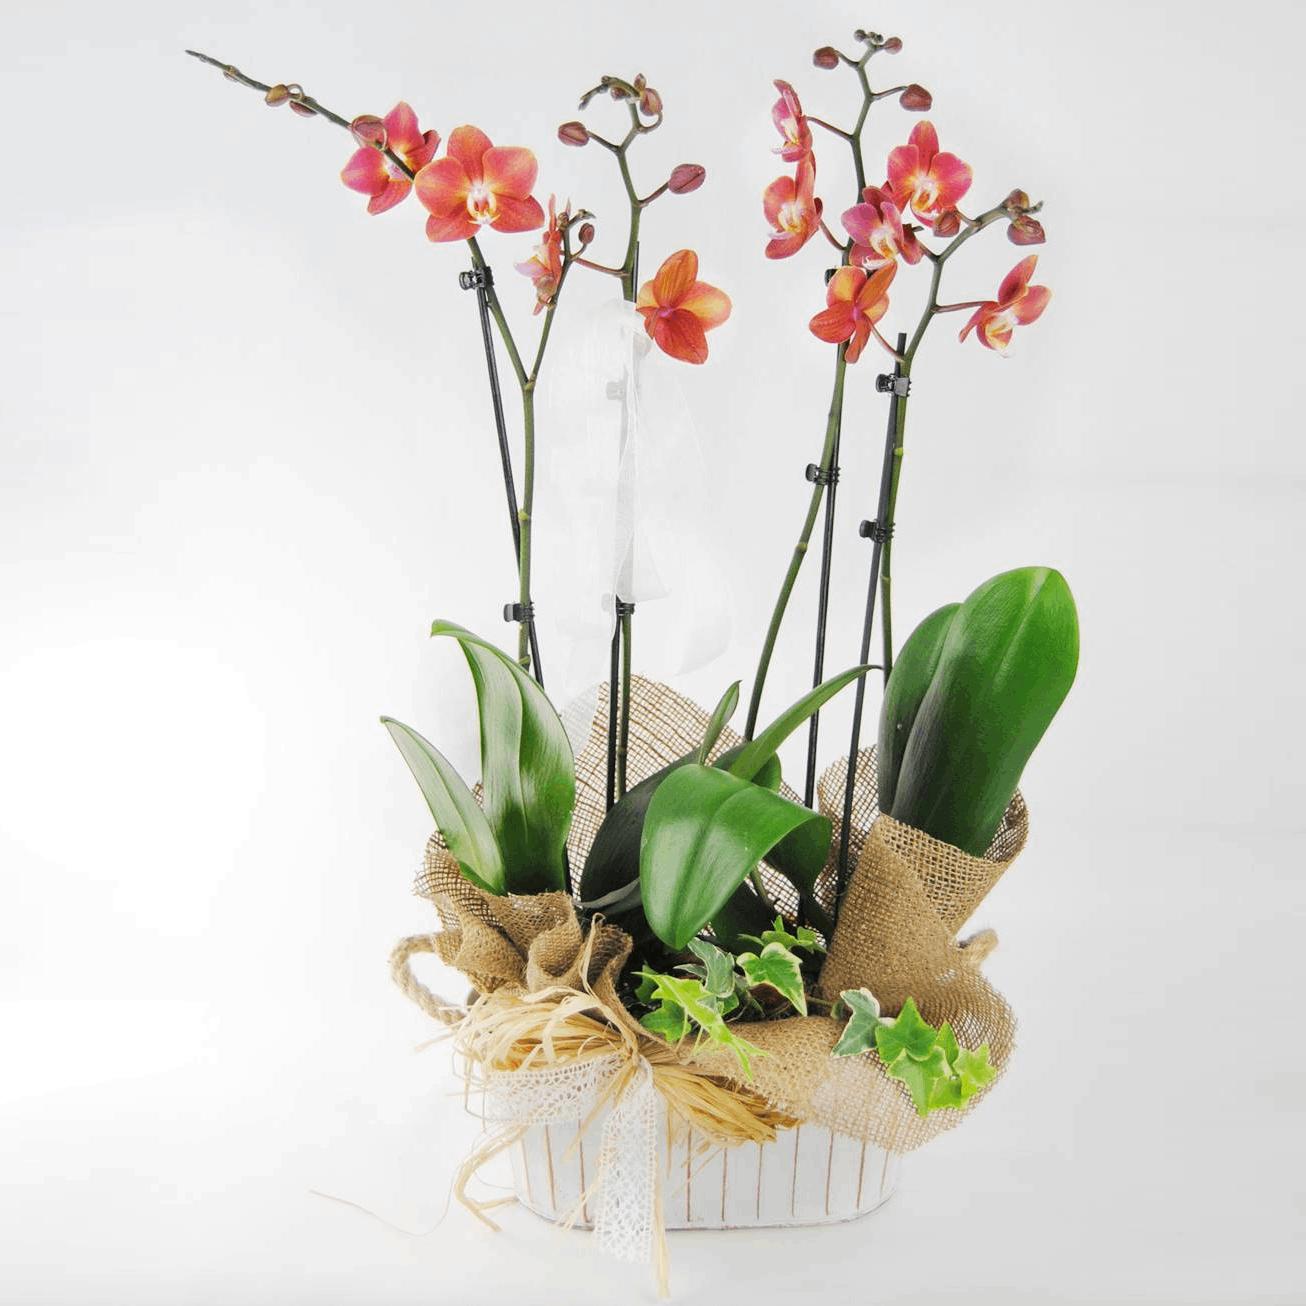 Orquídea Wild Fire - Comprar orquídea